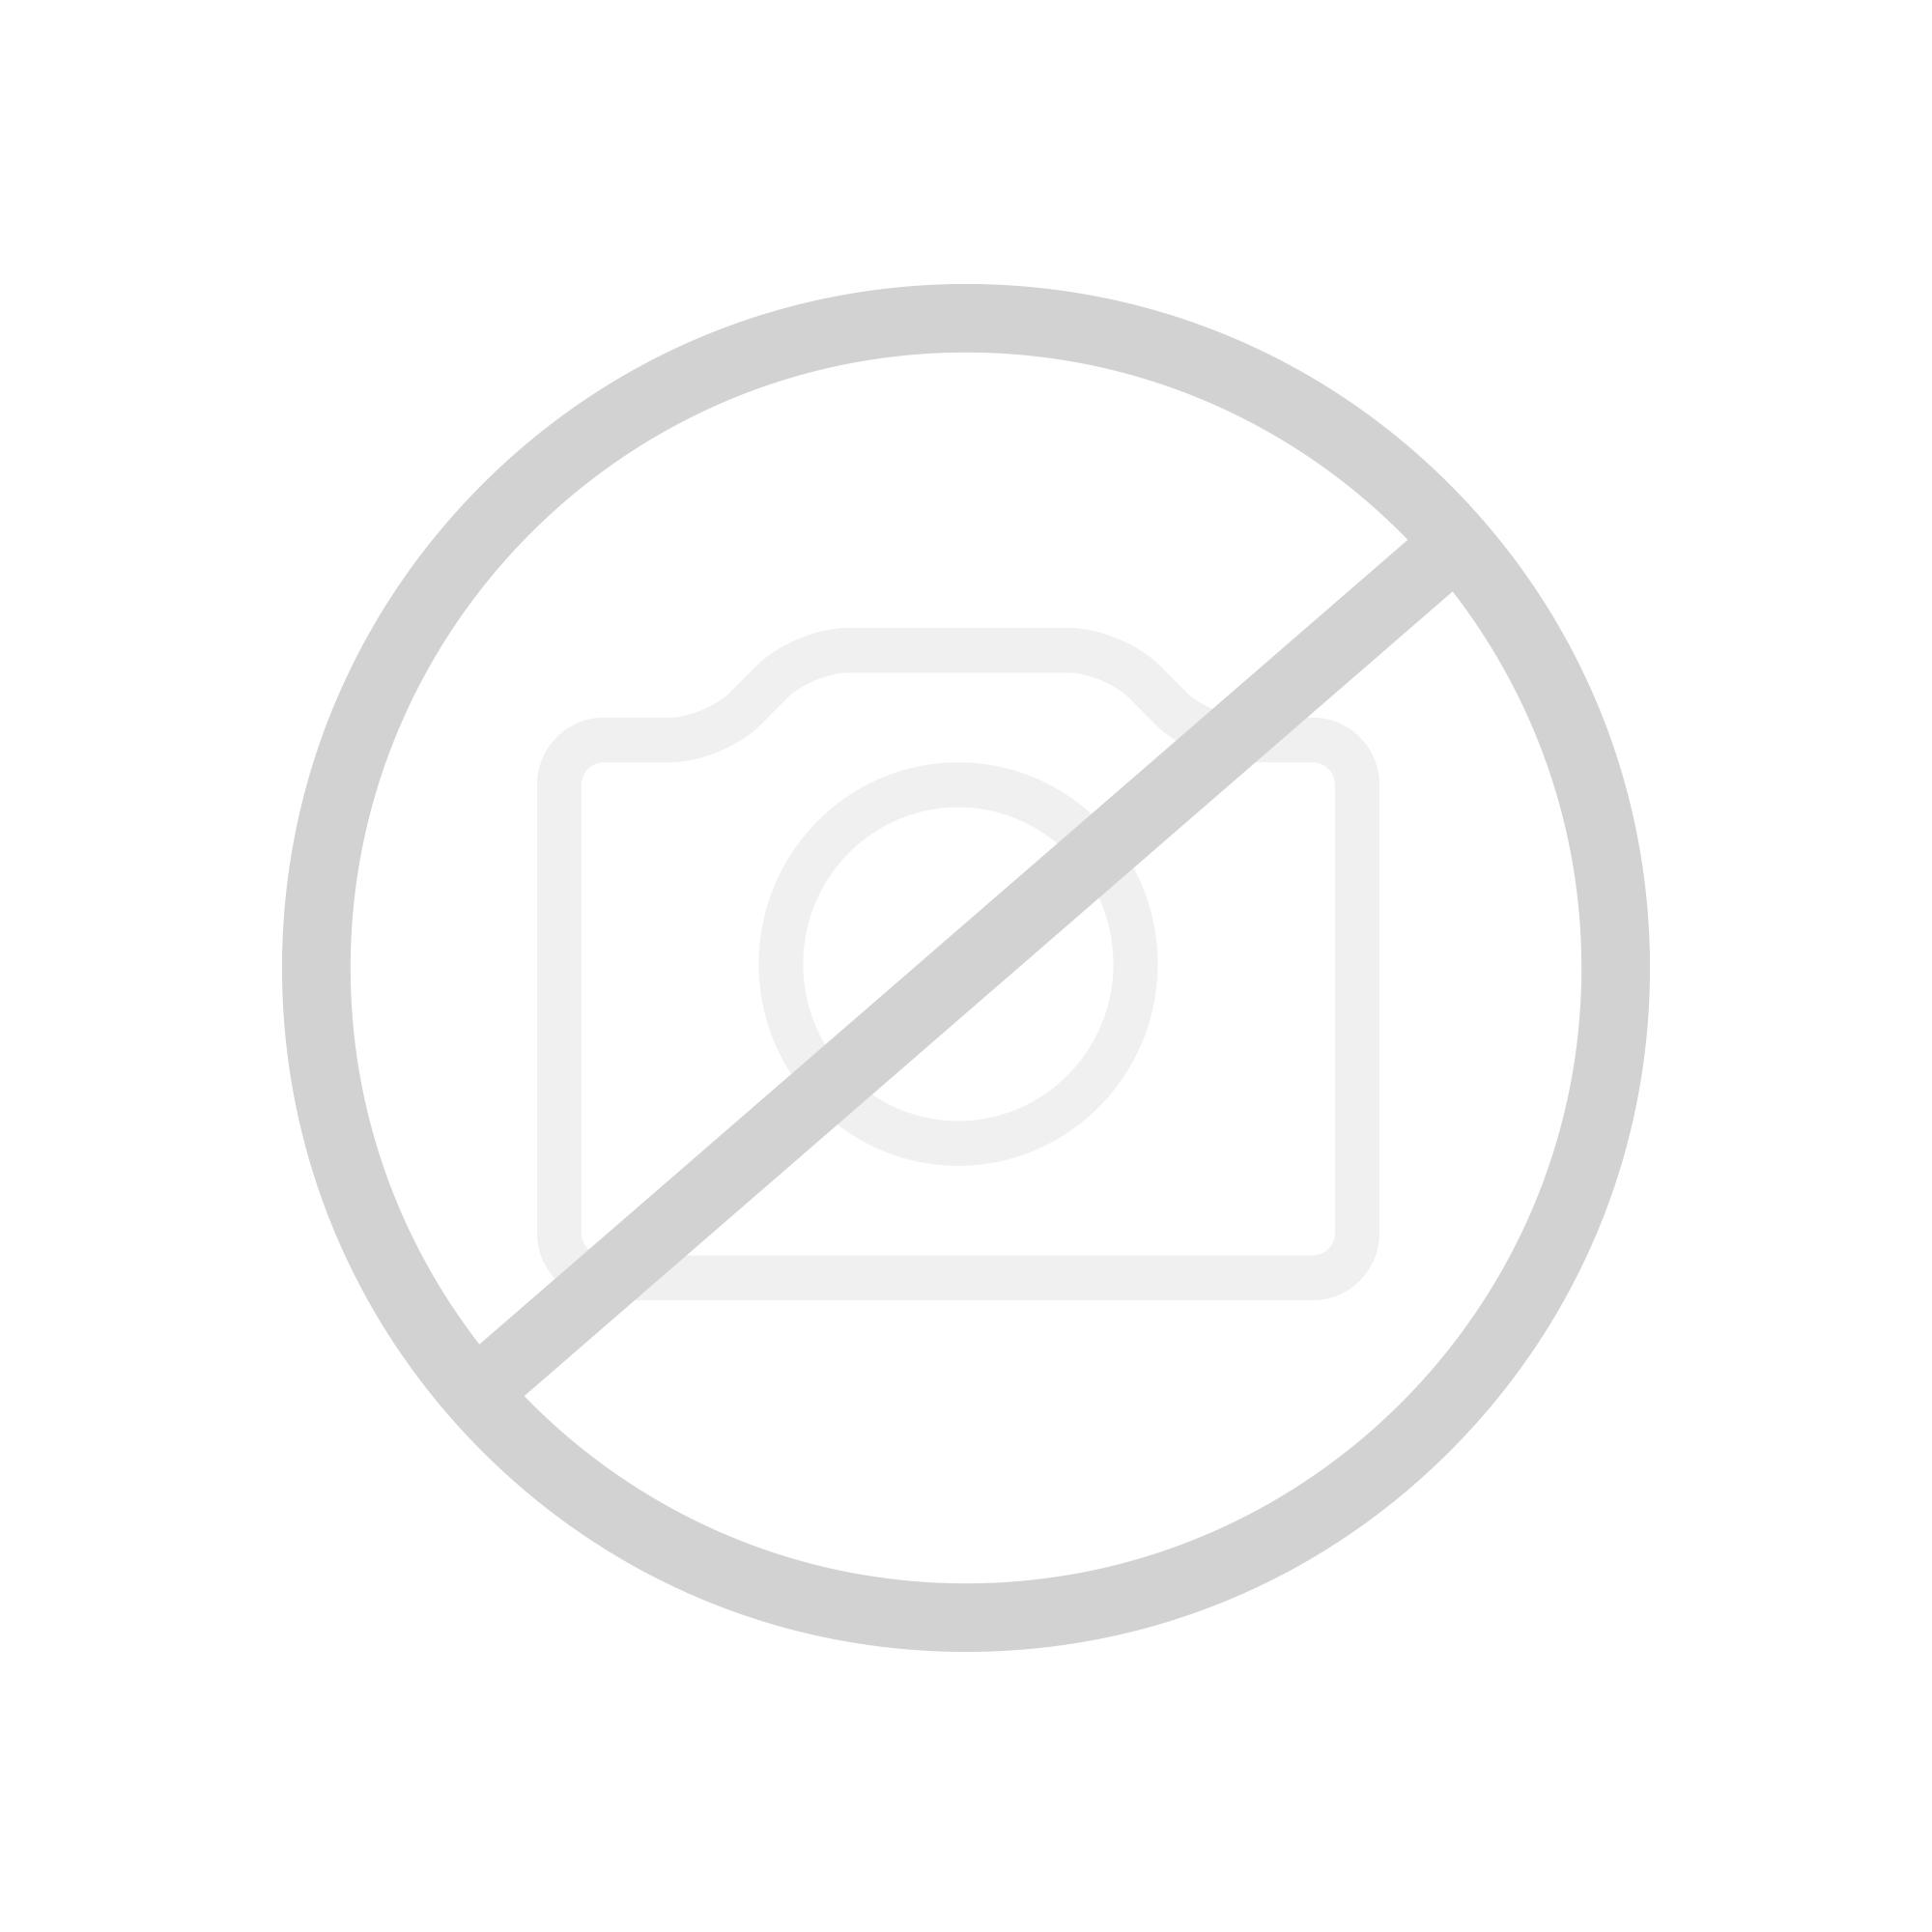 hansgrohe raindance select s 120 3jet handbrause chrom 26530000 reuter onlineshop. Black Bedroom Furniture Sets. Home Design Ideas